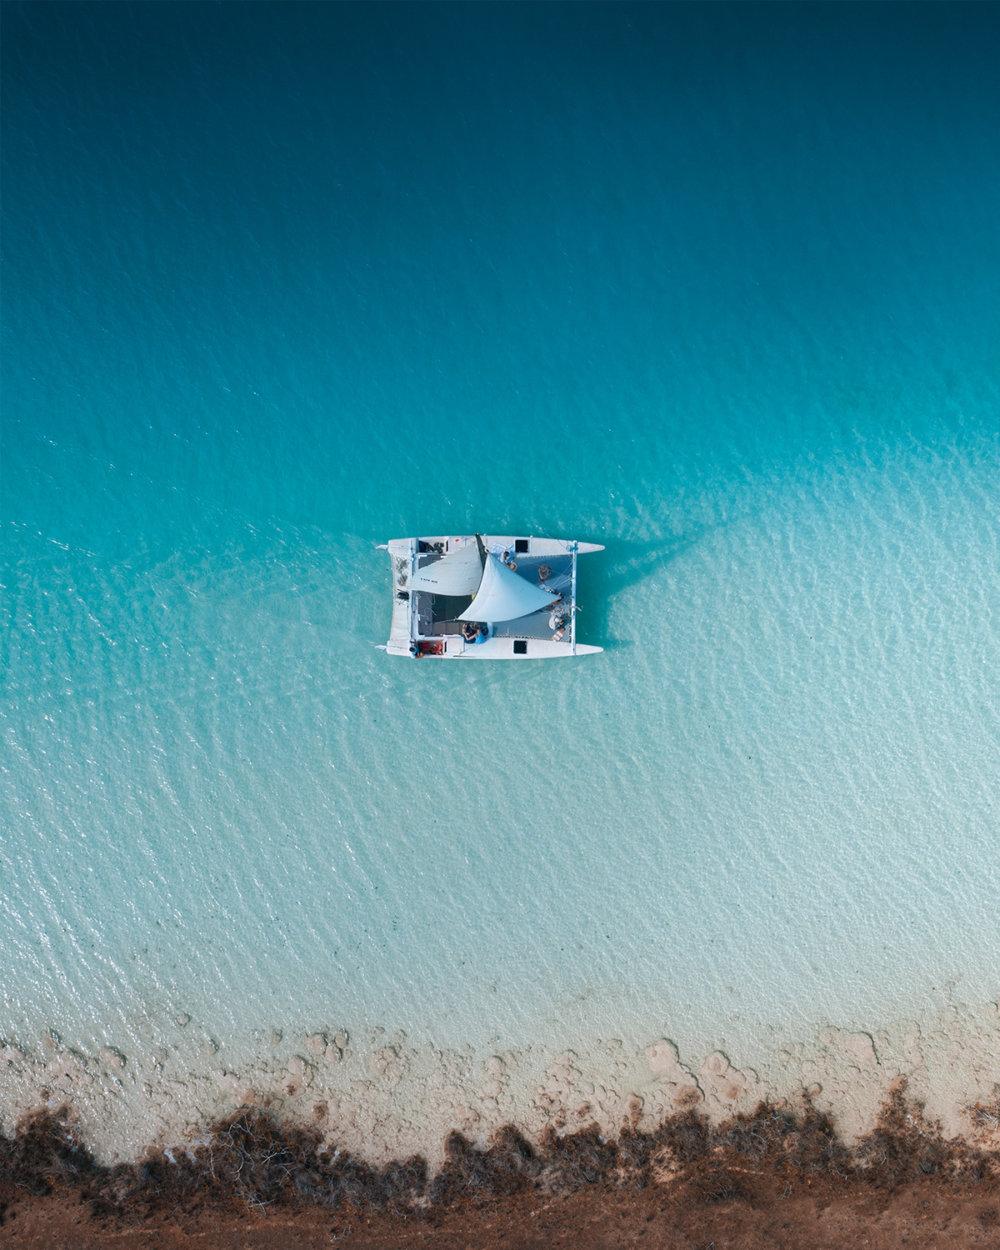 Mexico From Above Aerial Photography Series By Dimitar Karanikolov 8